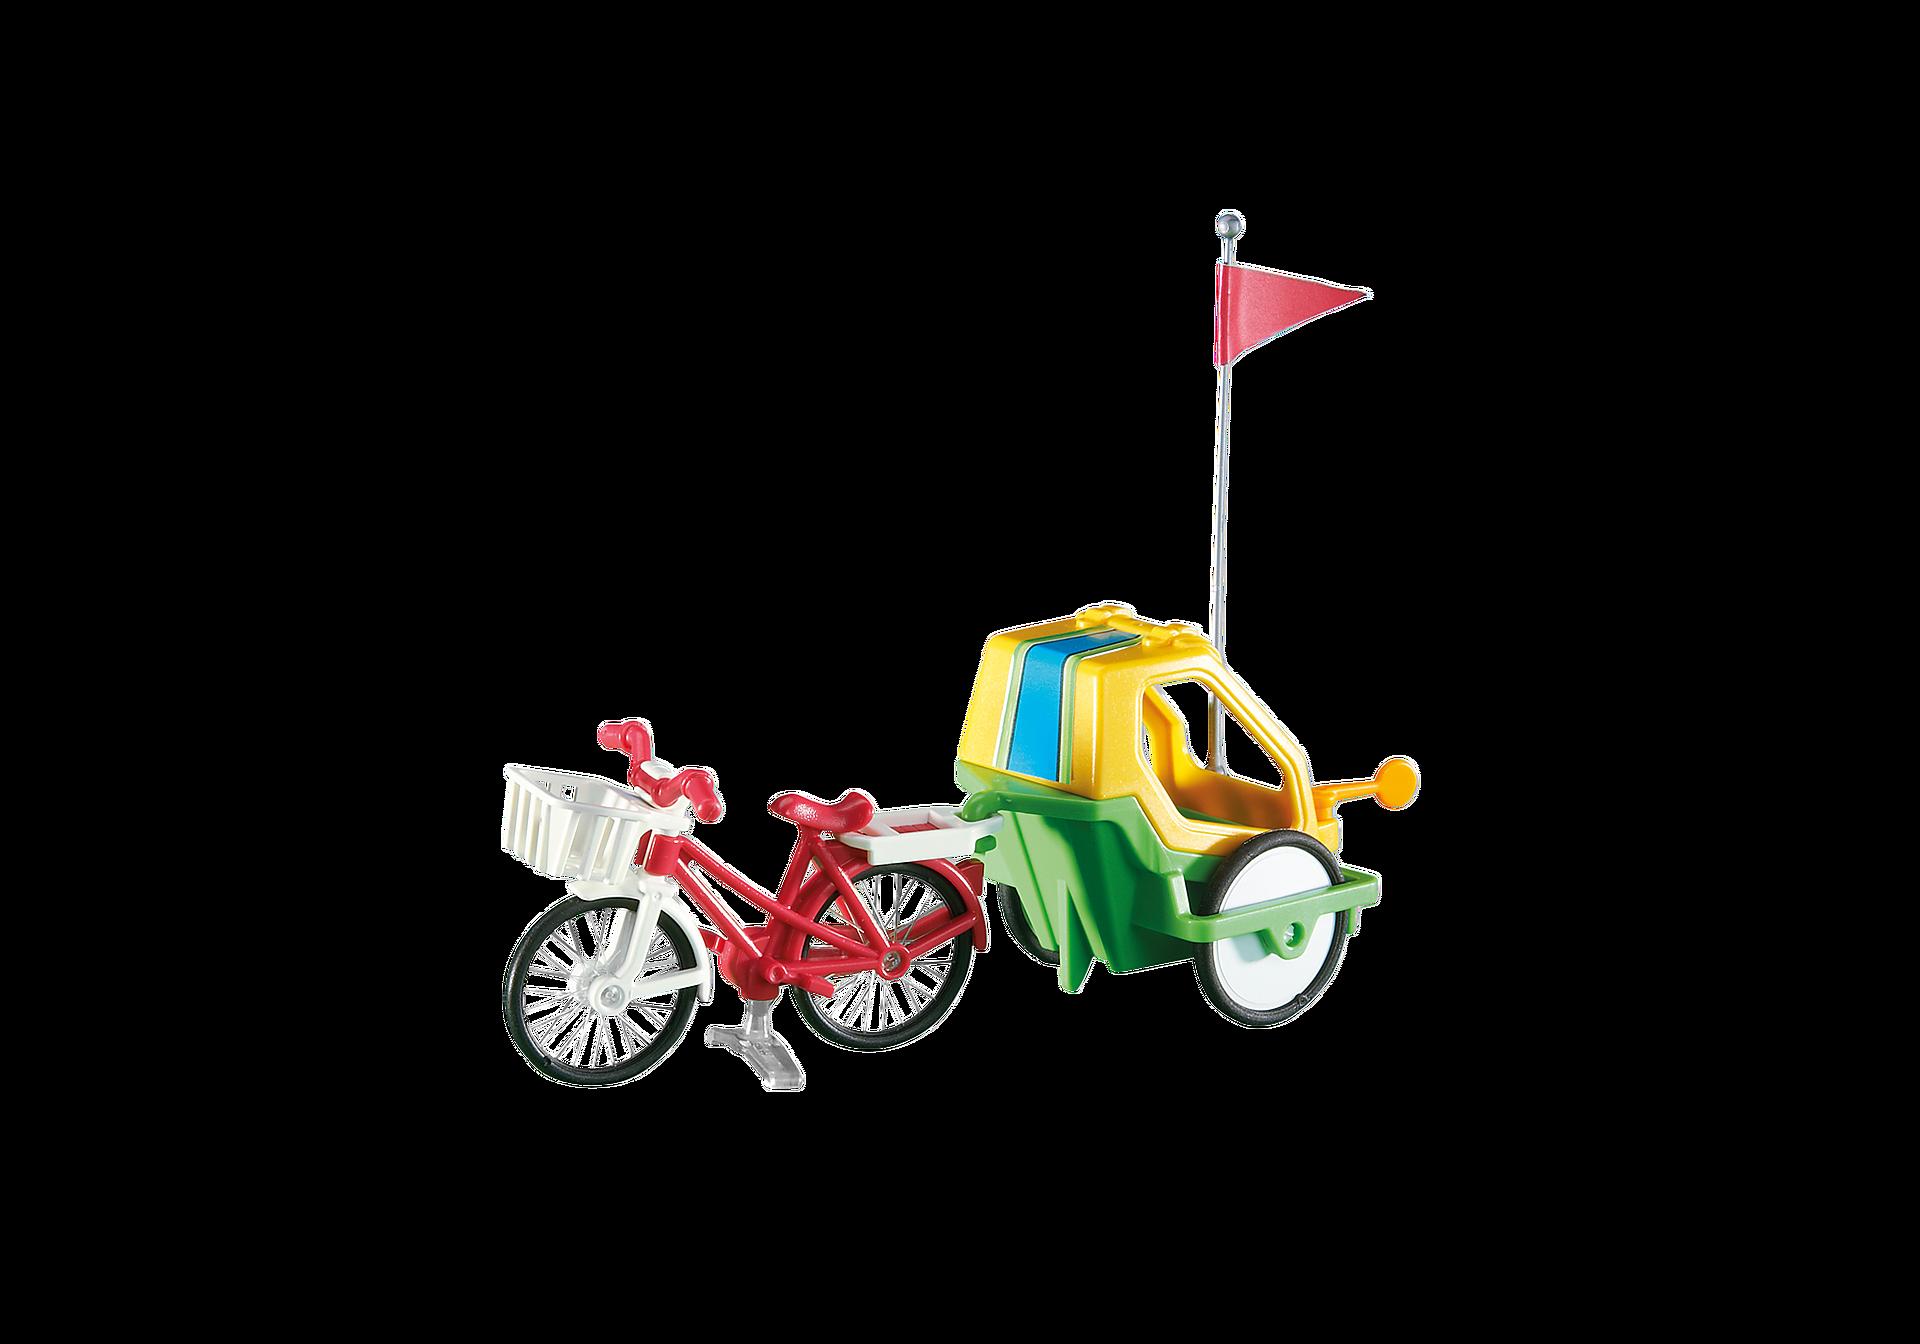 6388 Cykel med barnvagn zoom image1